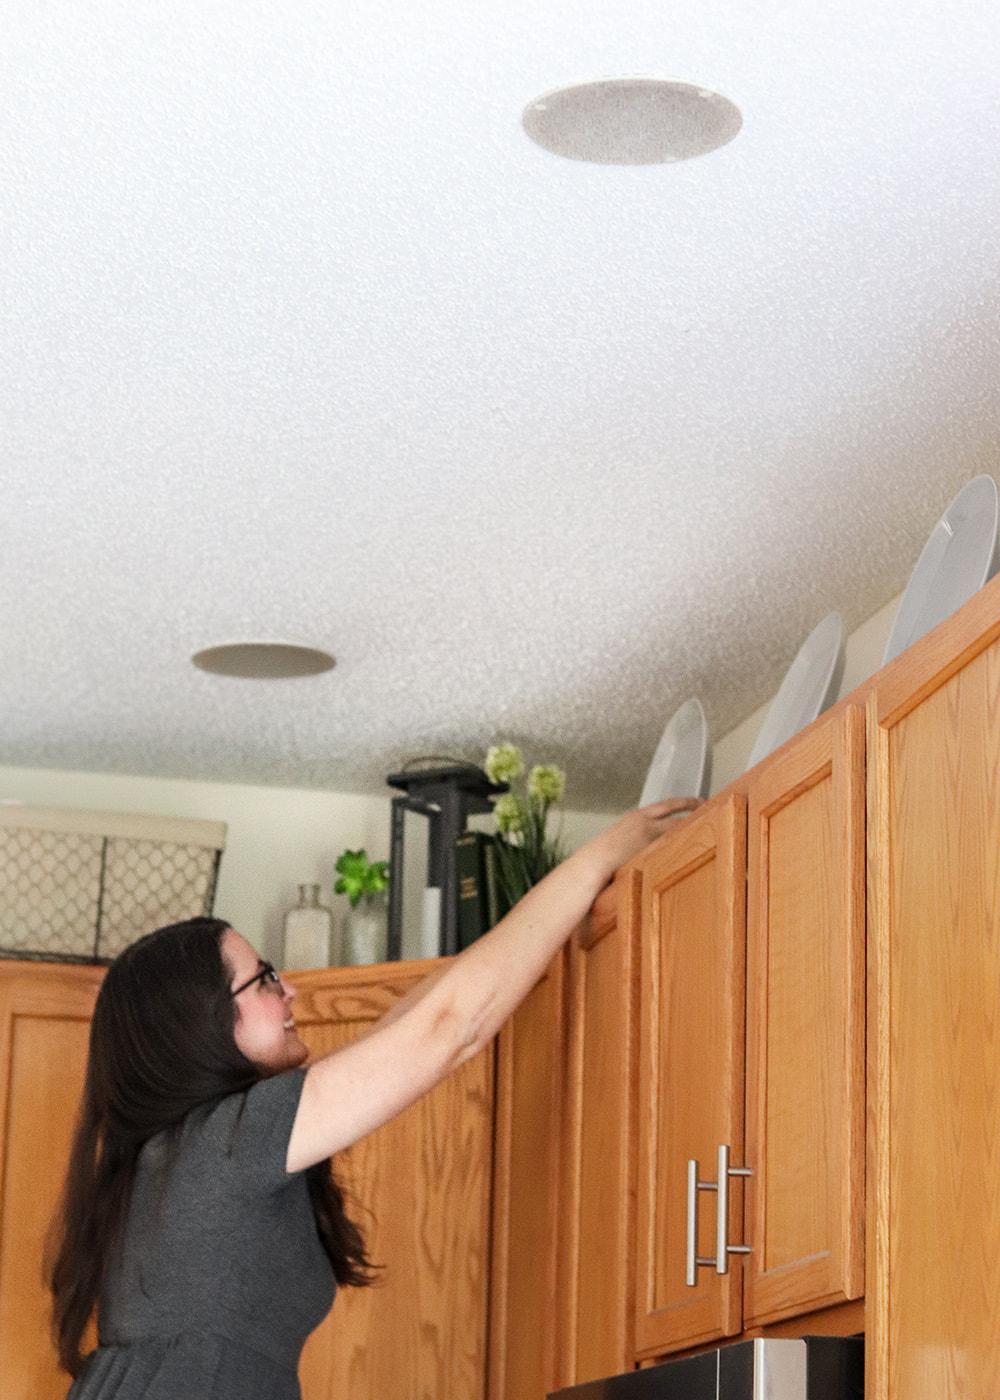 designer Julia Fain decorating with plates over oak cabinets